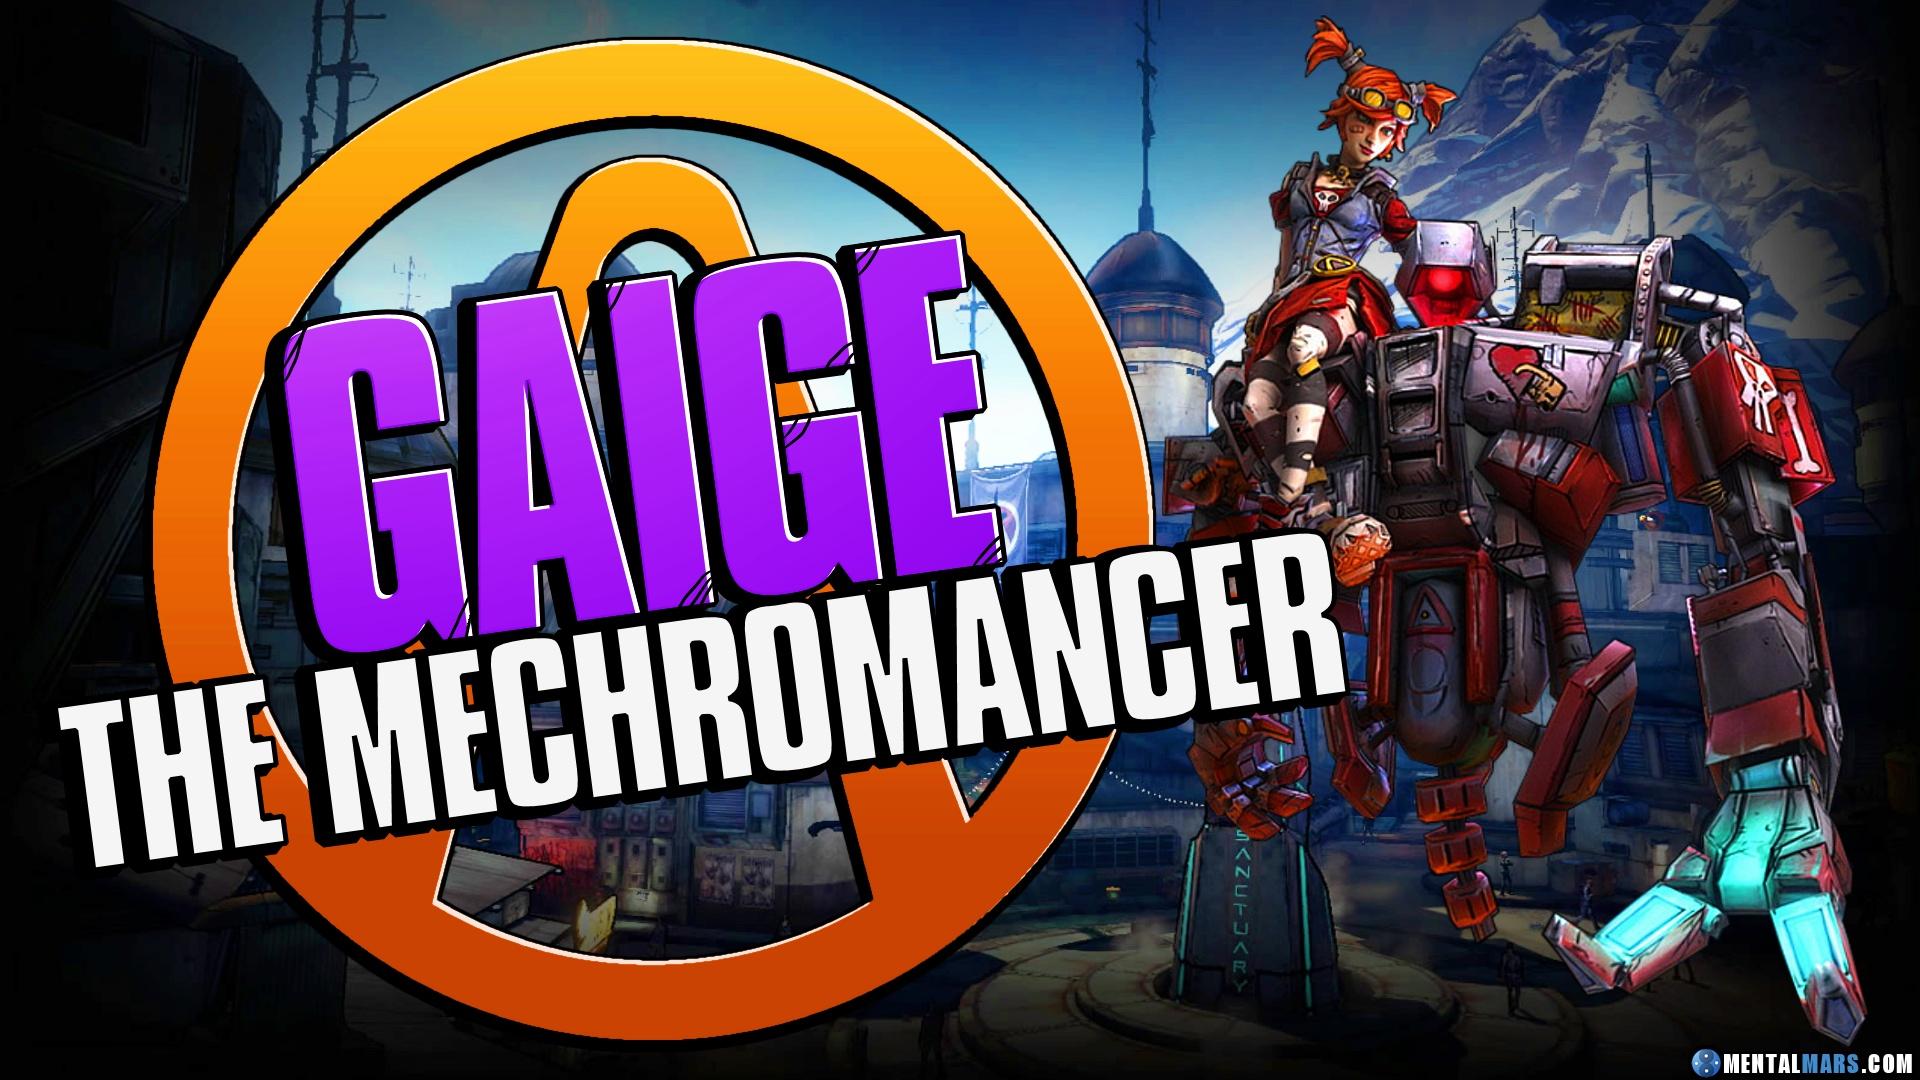 Gaige - the Mechromancer » Borderlands 2 Characters » MentalMars